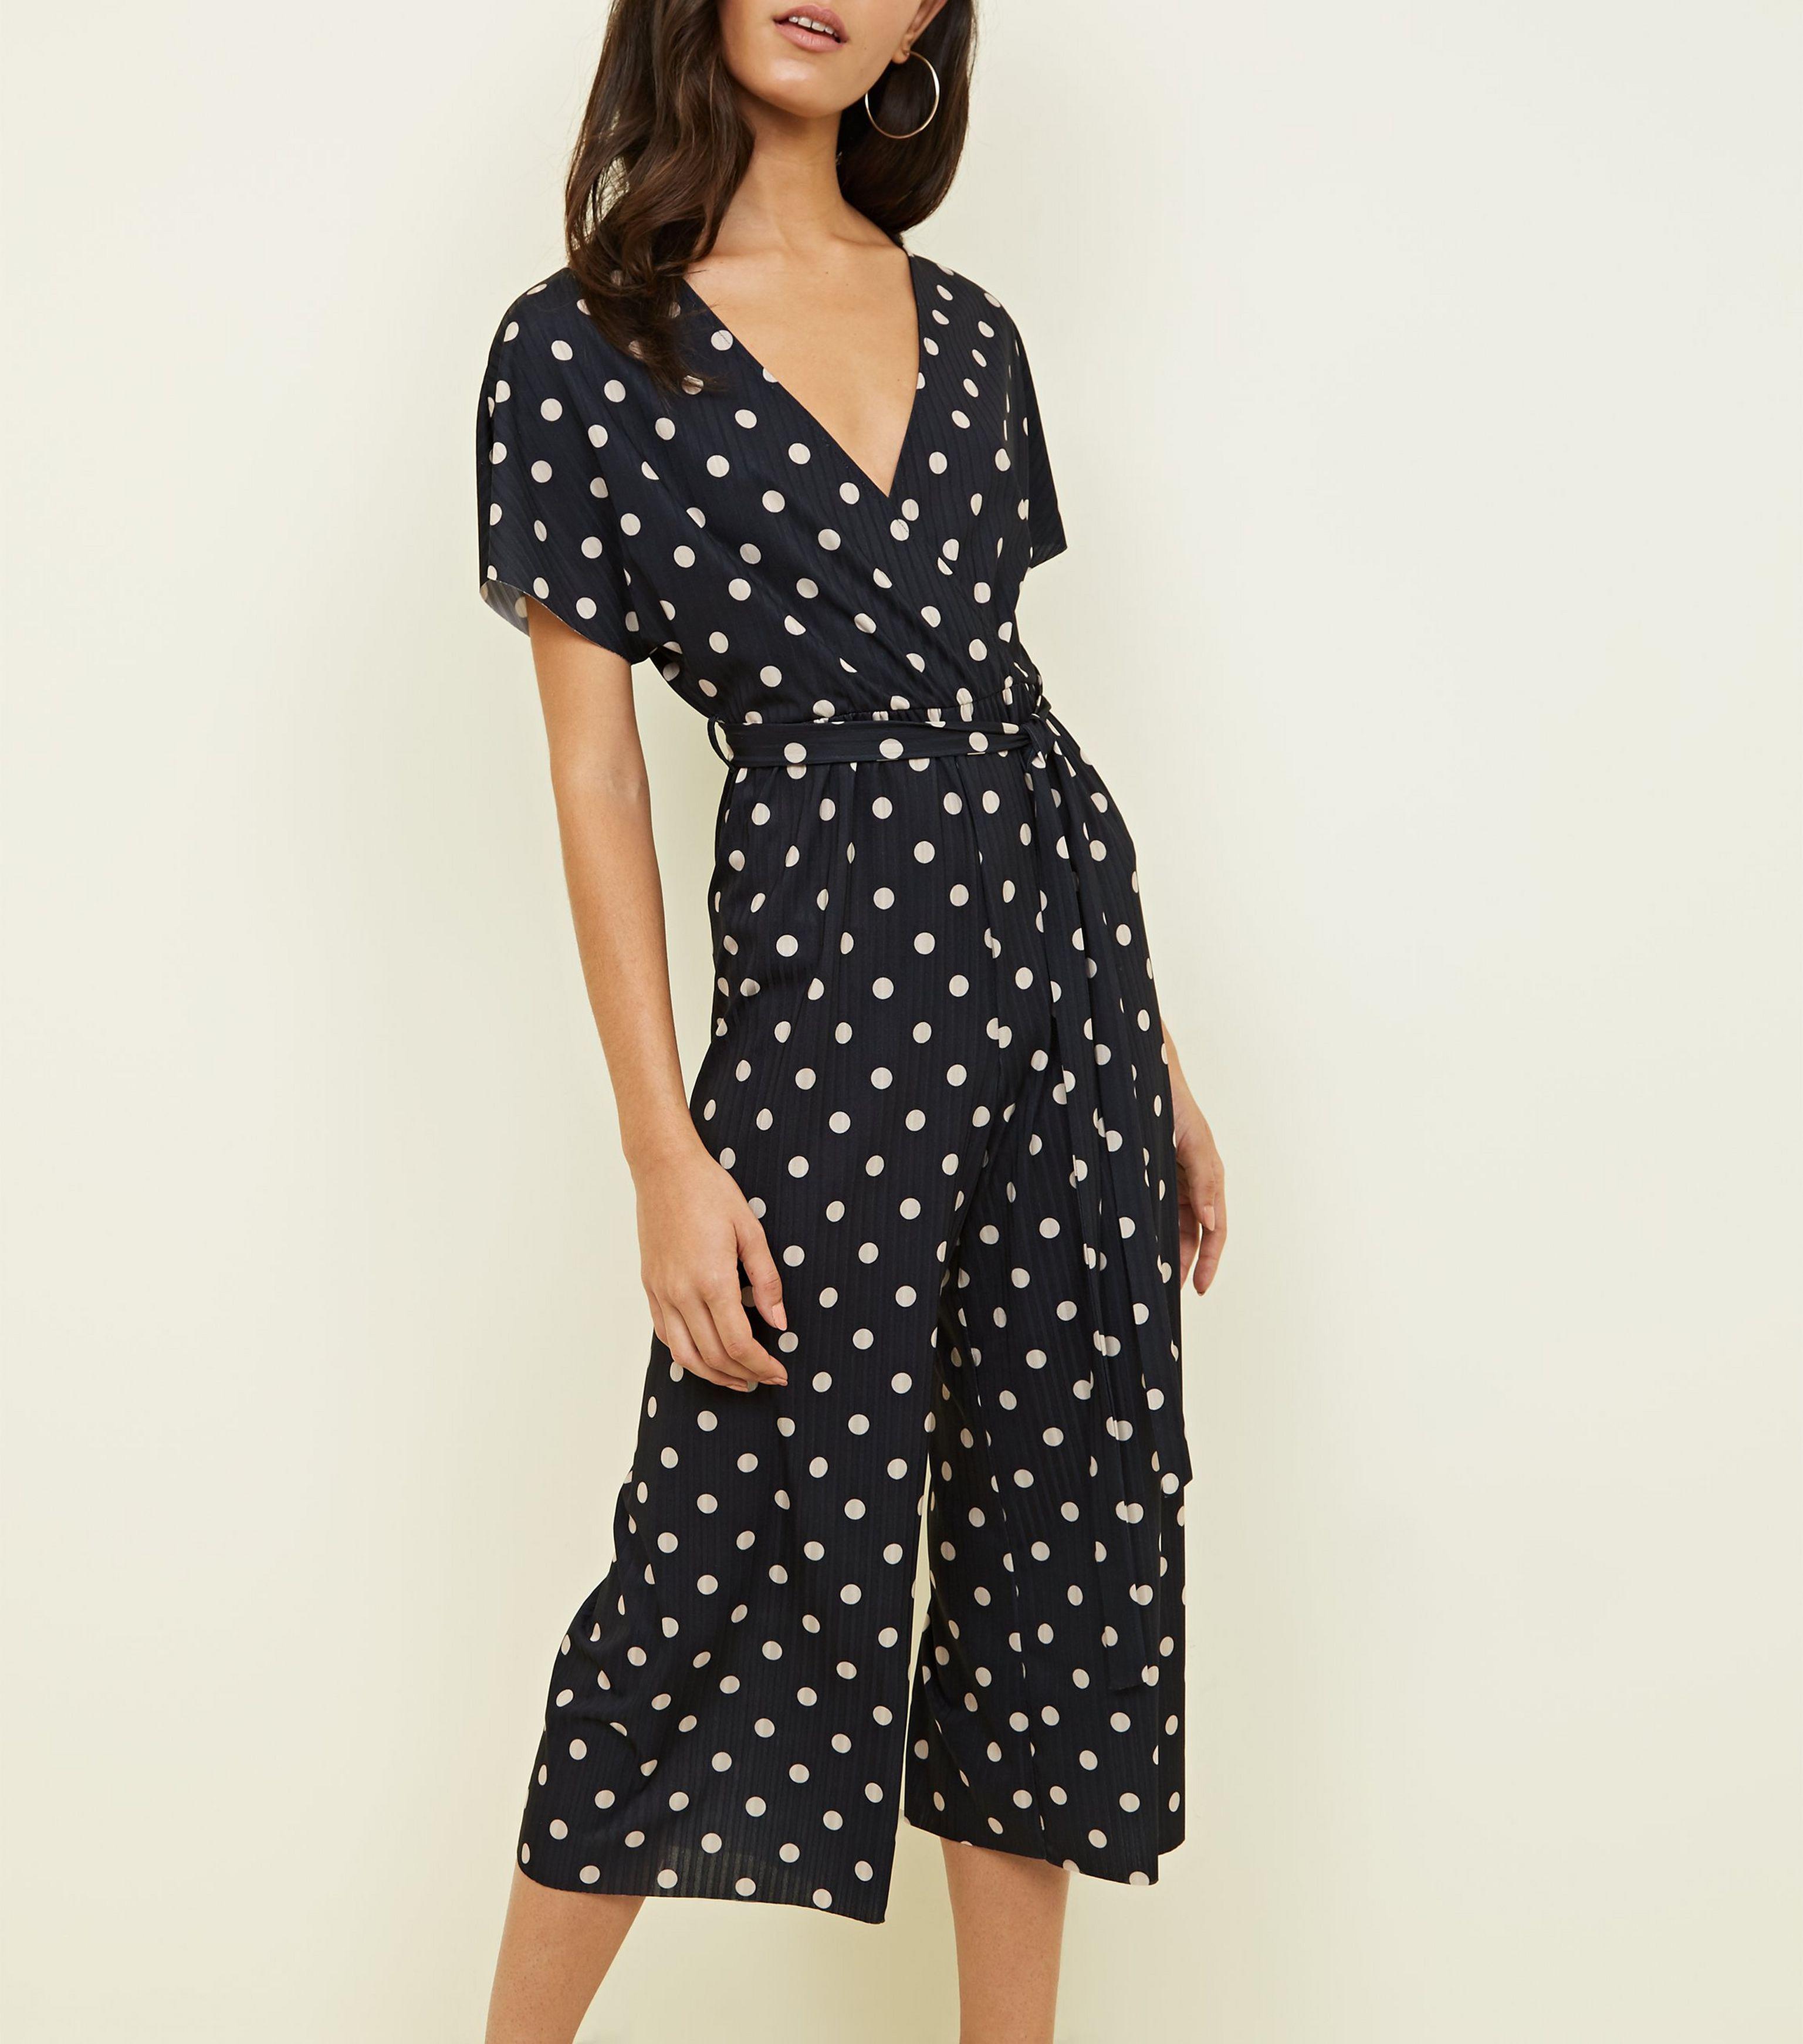 63ea26fd48 New Look Black Spot Print Wrap Culotte Jumpsuit in Black - Lyst